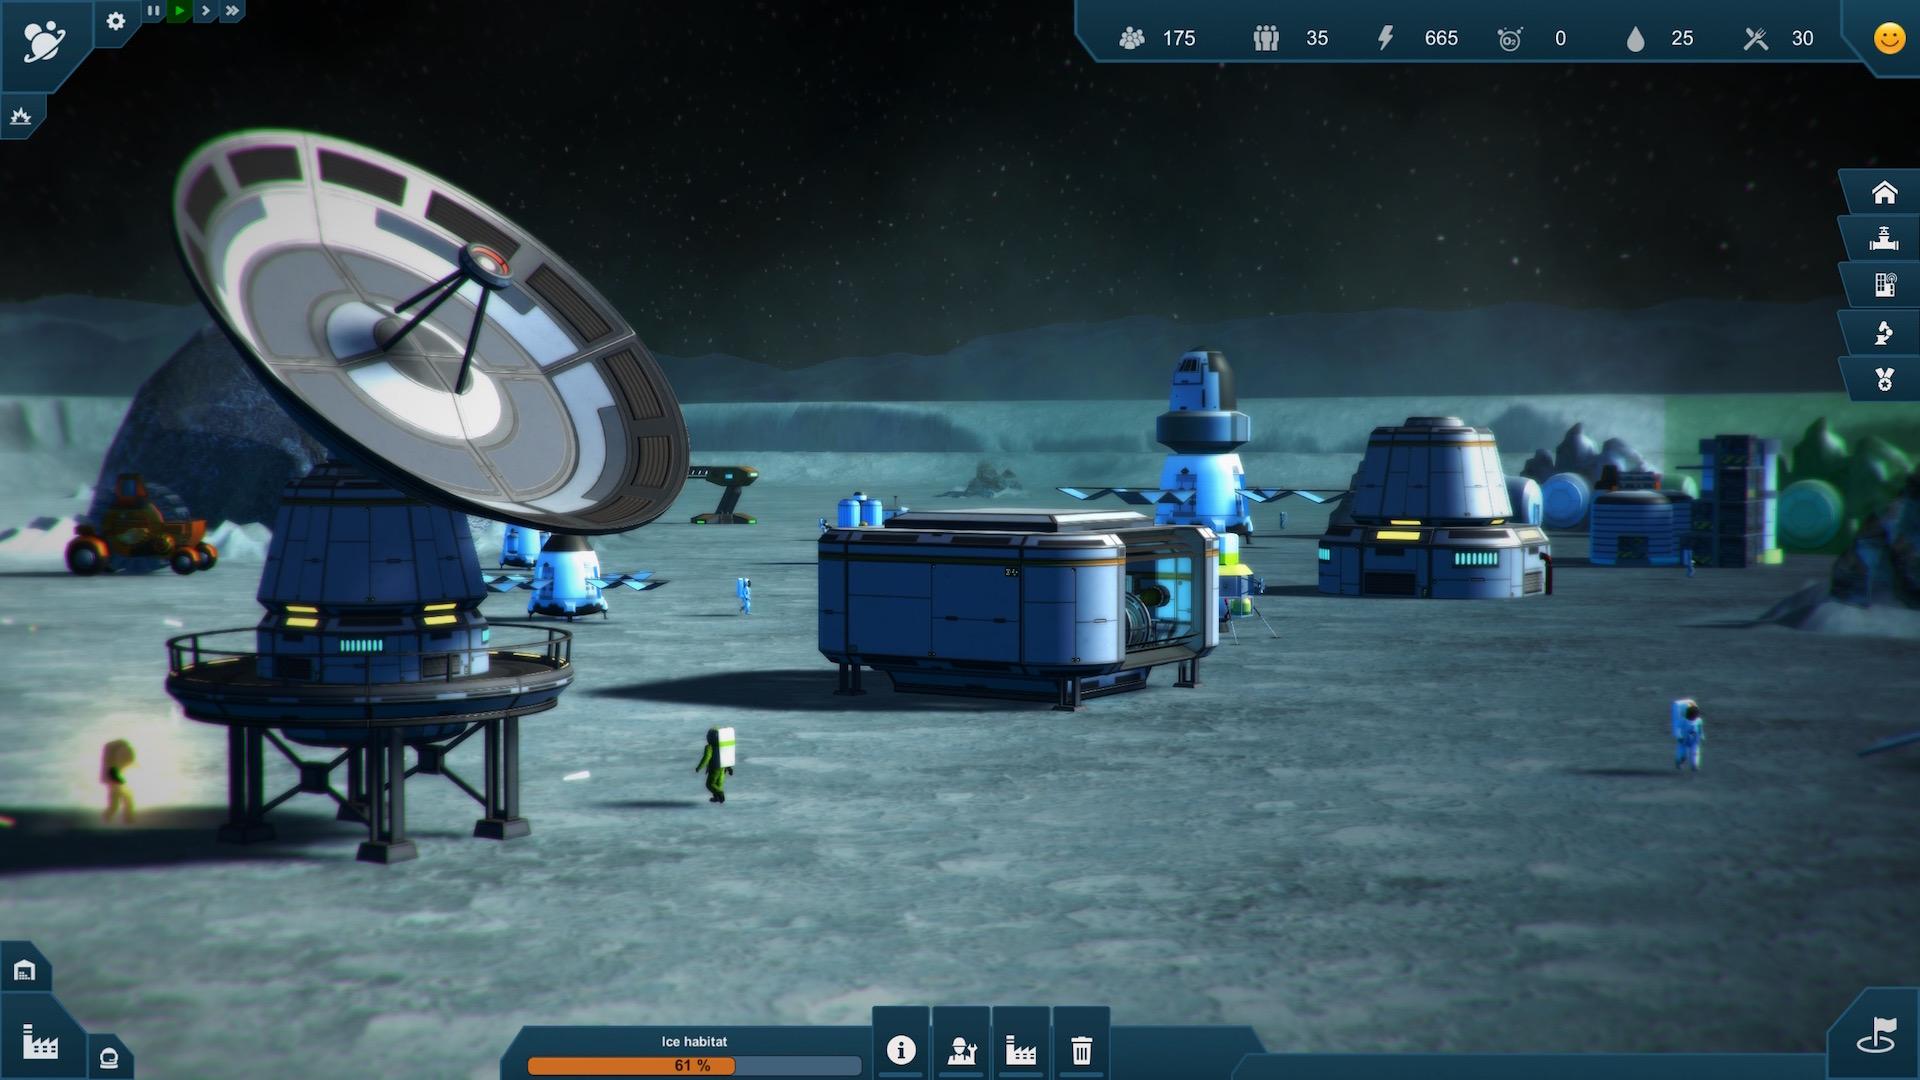 Earth Space Colonies Screenshot 2